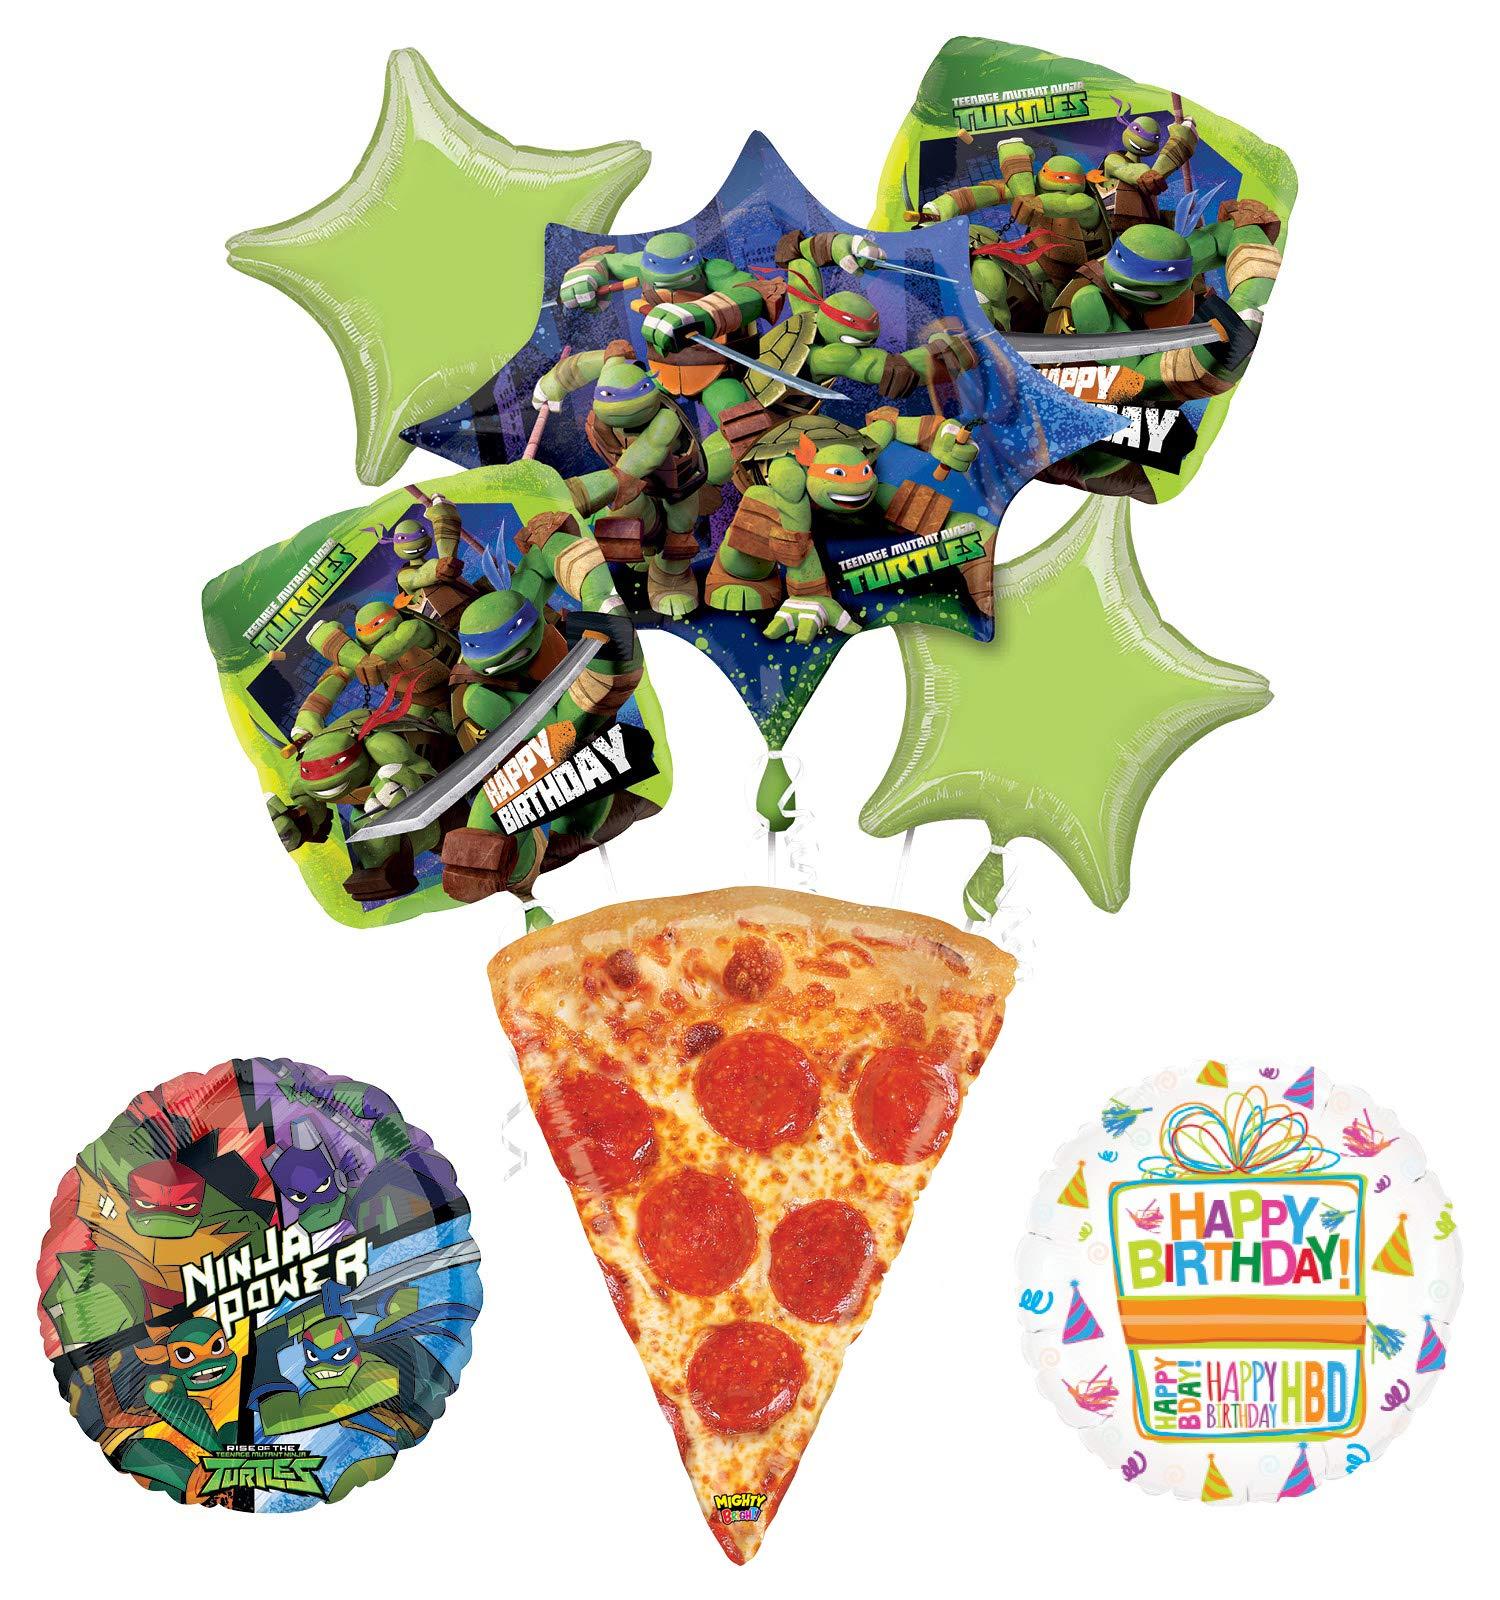 Mayflower Teenage Mutant Ninja Turtles Birthday Party Supplies TMNT Pizza Balloon Bouquet Decorations